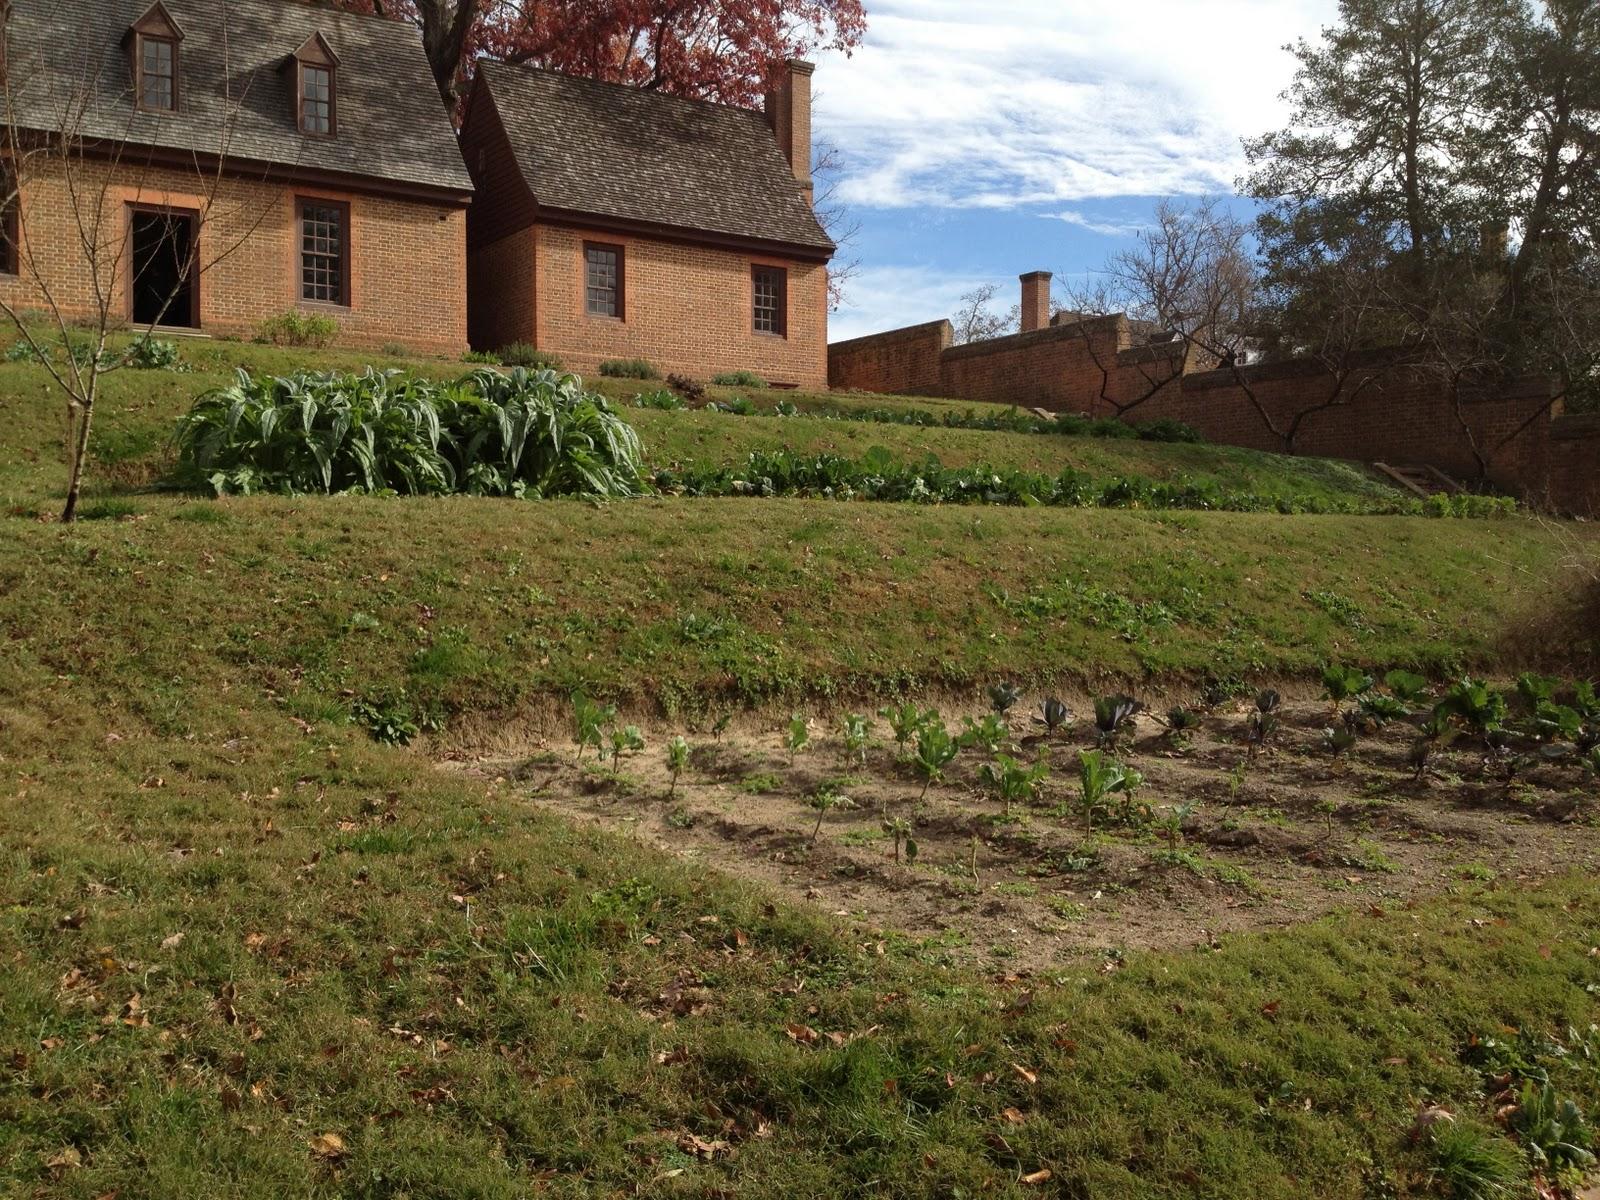 Garden Tour Governor S Palace Kitchen Garden